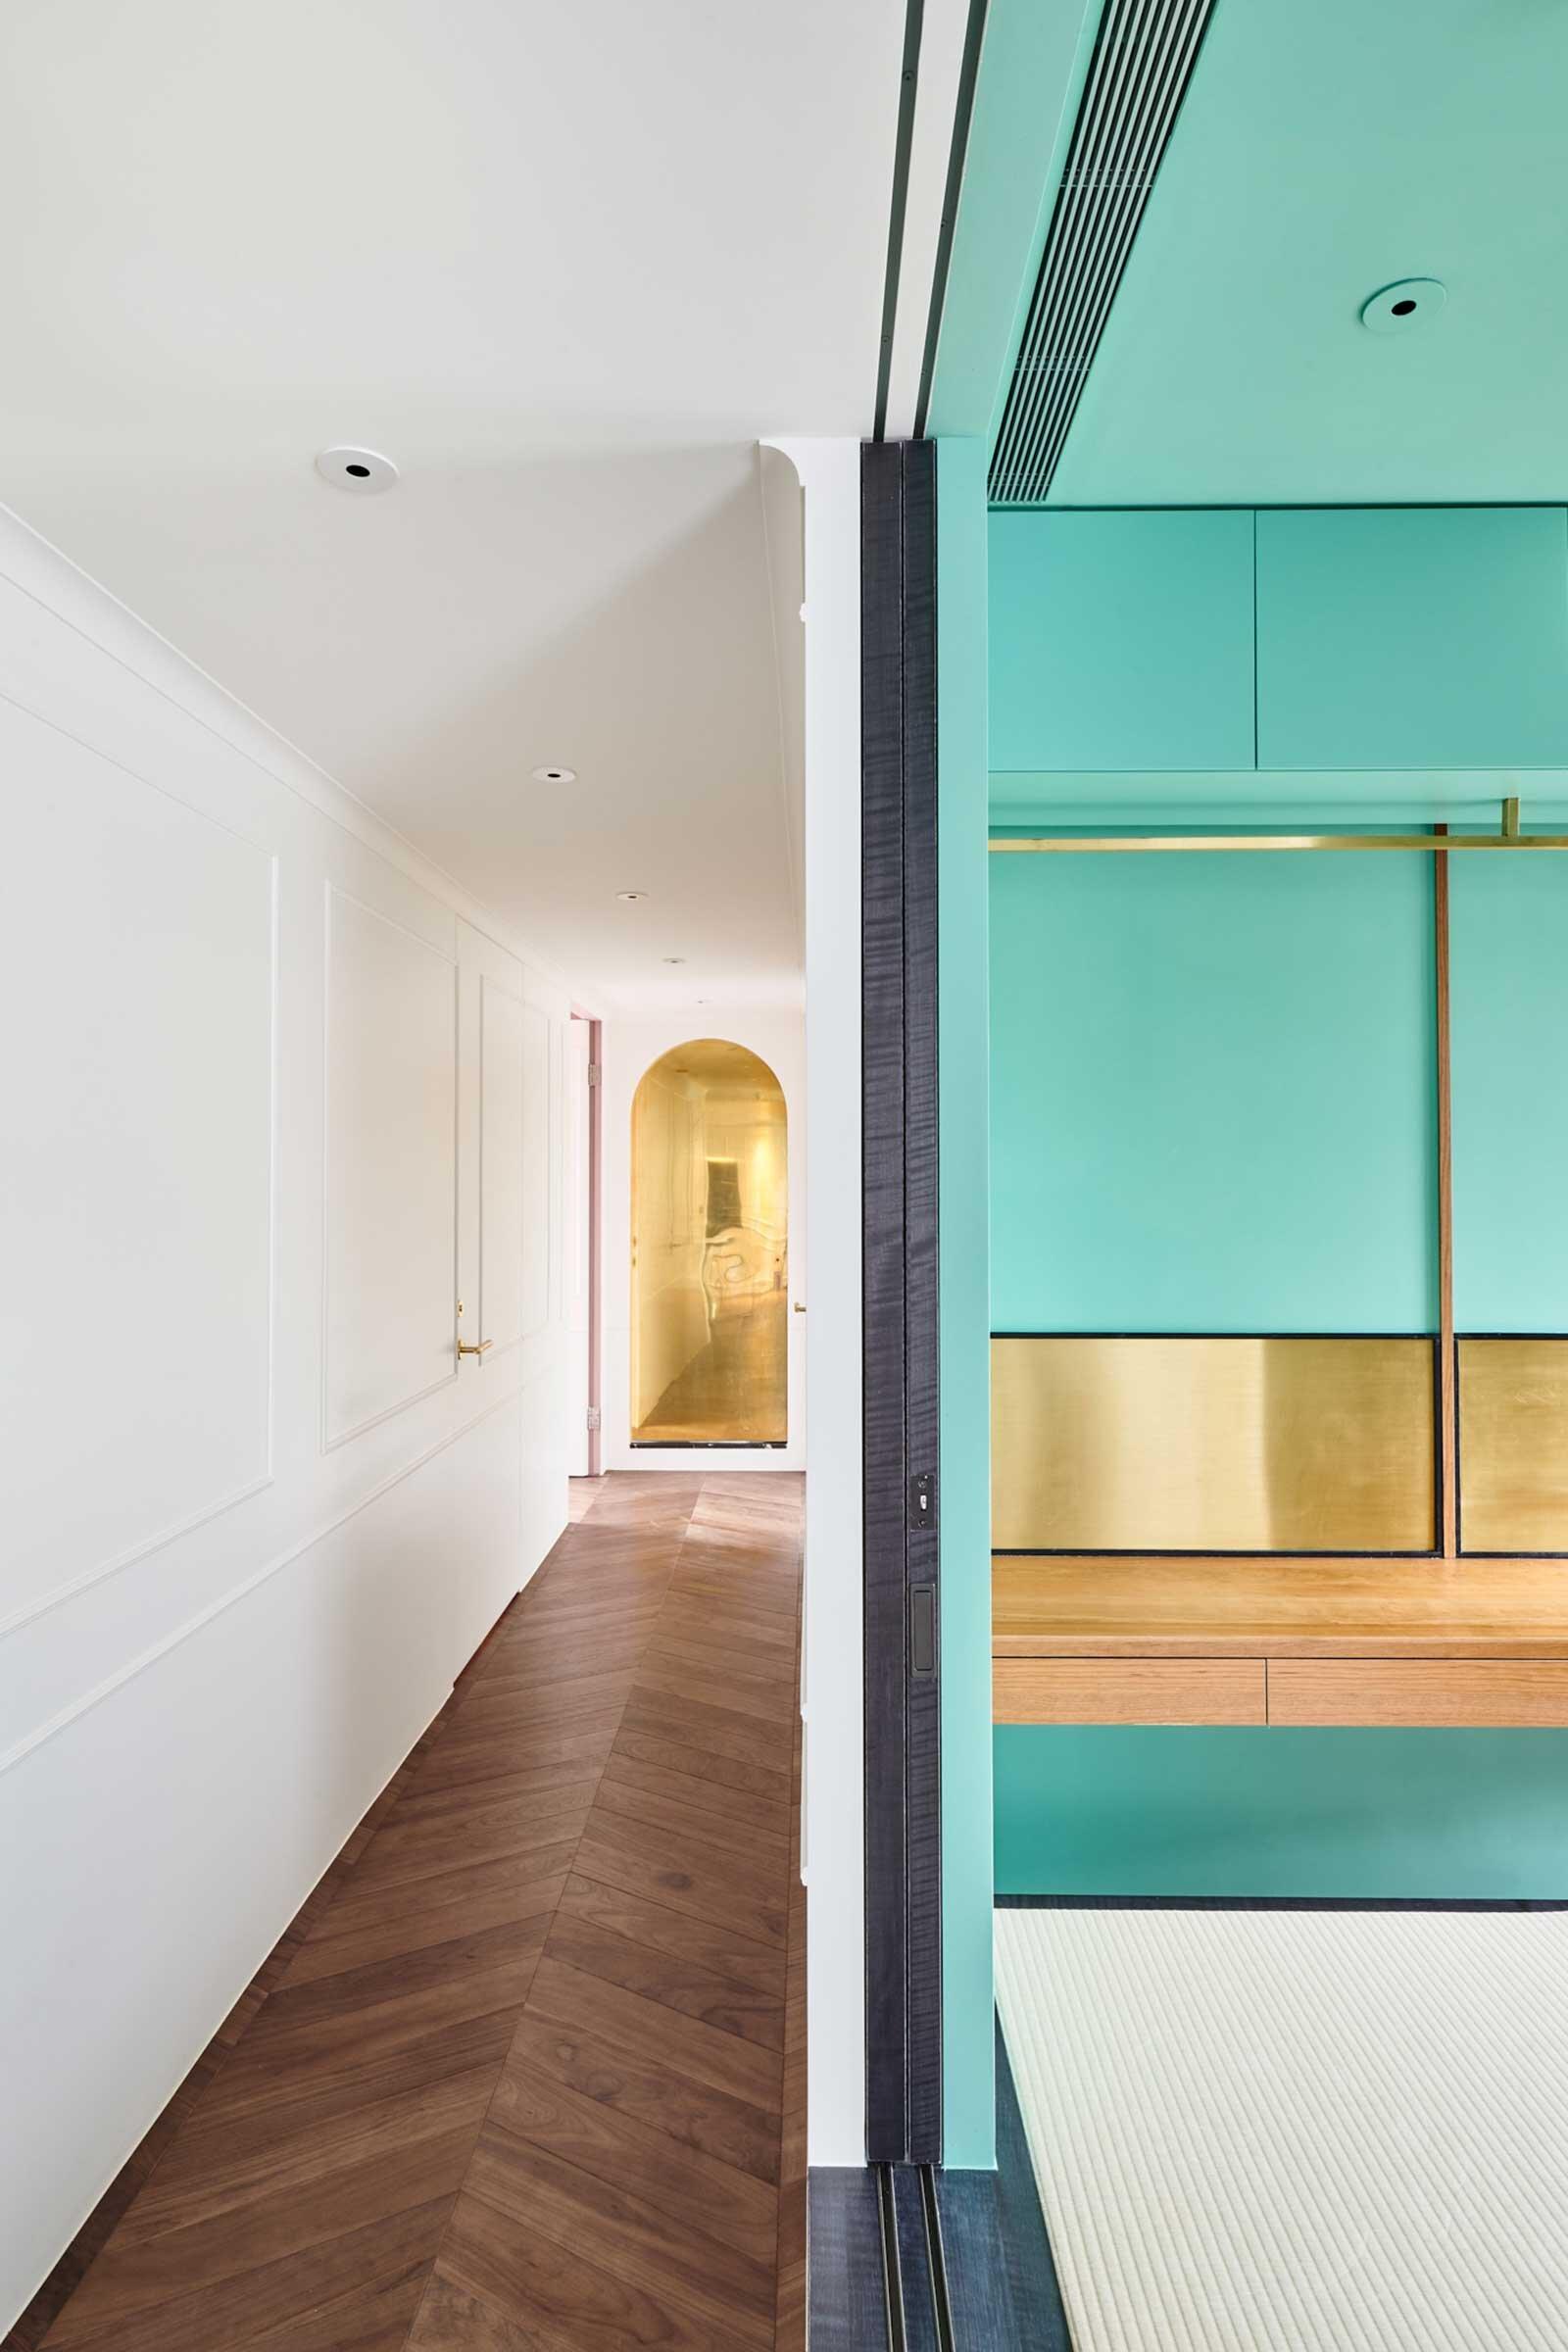 Chen-Studio-Yi-Hsiang-Chao-Architects_DSC0595@0,25x.jpg